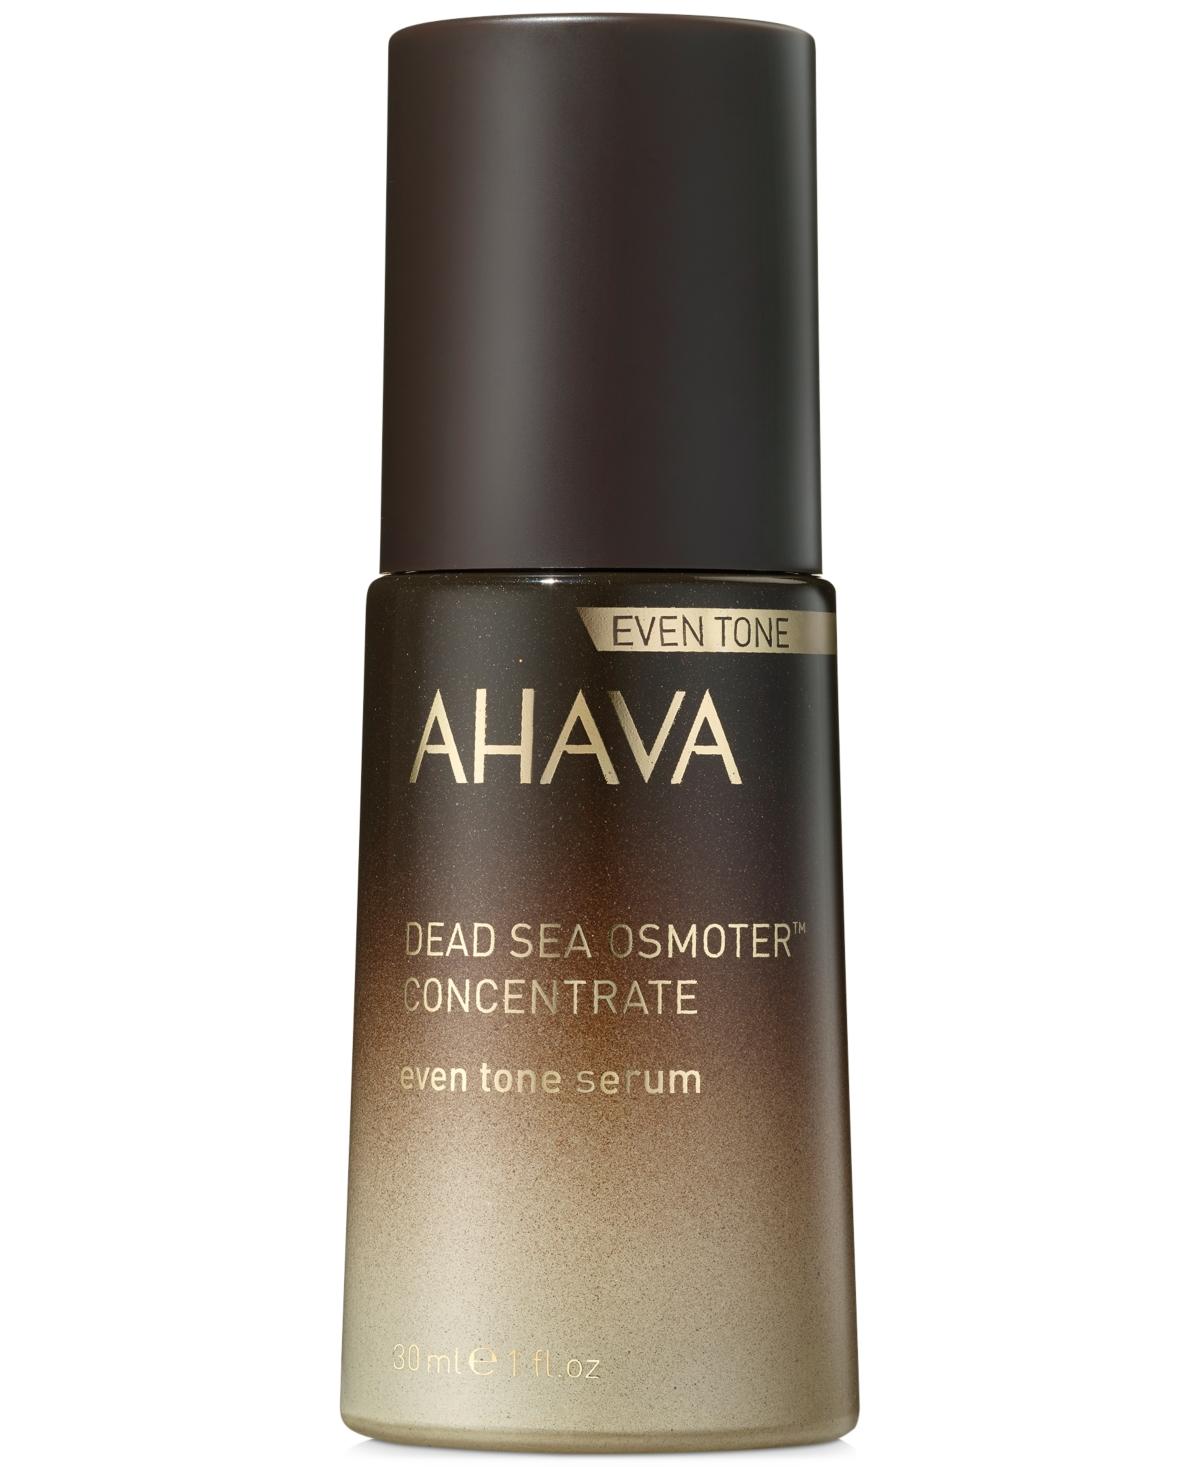 Ahava Dead Sea Osmoter Concentrate Even Tone Serum, 1-oz.